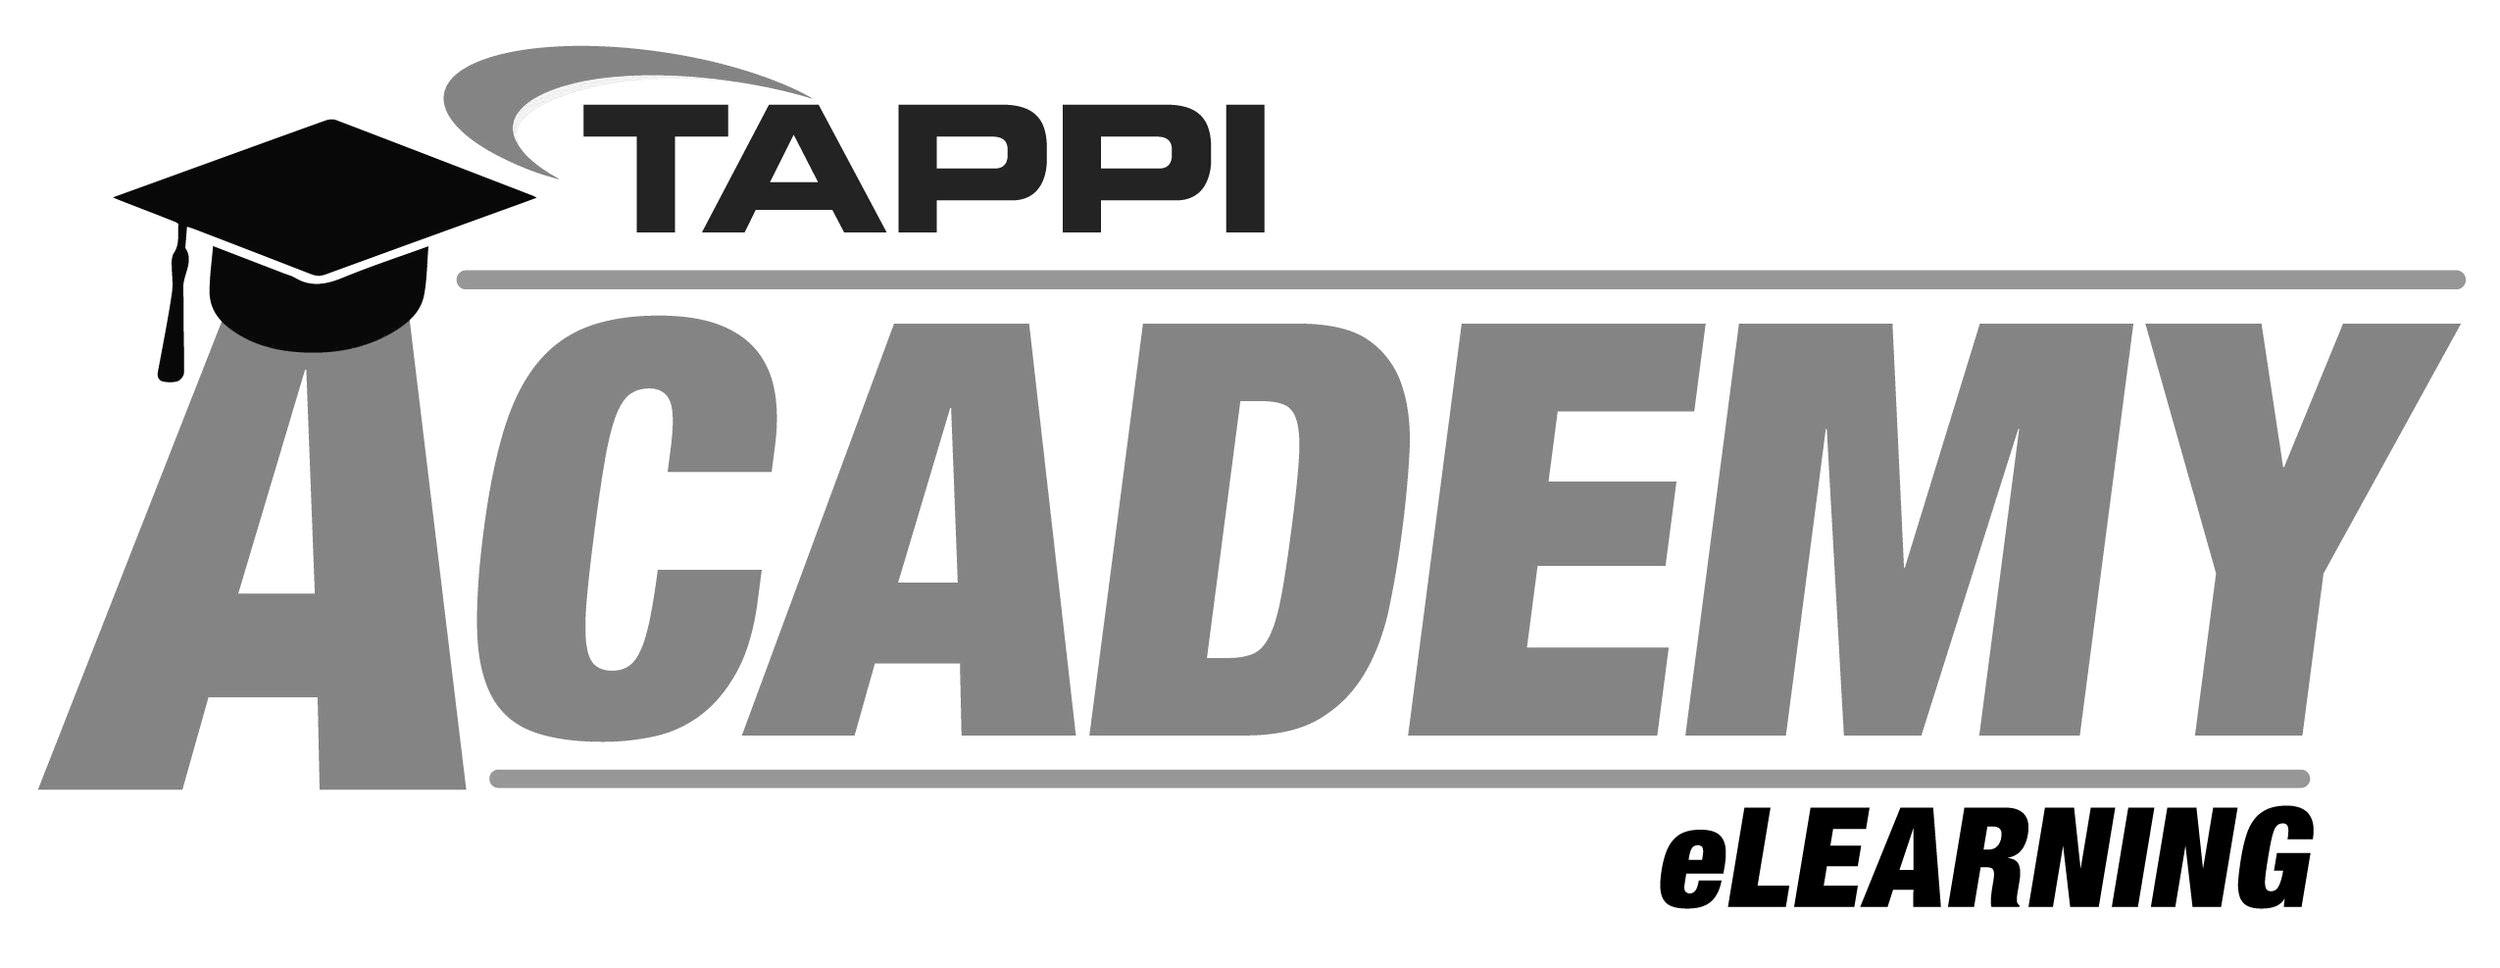 TAPPI_Academy_eLearn-01.jpg